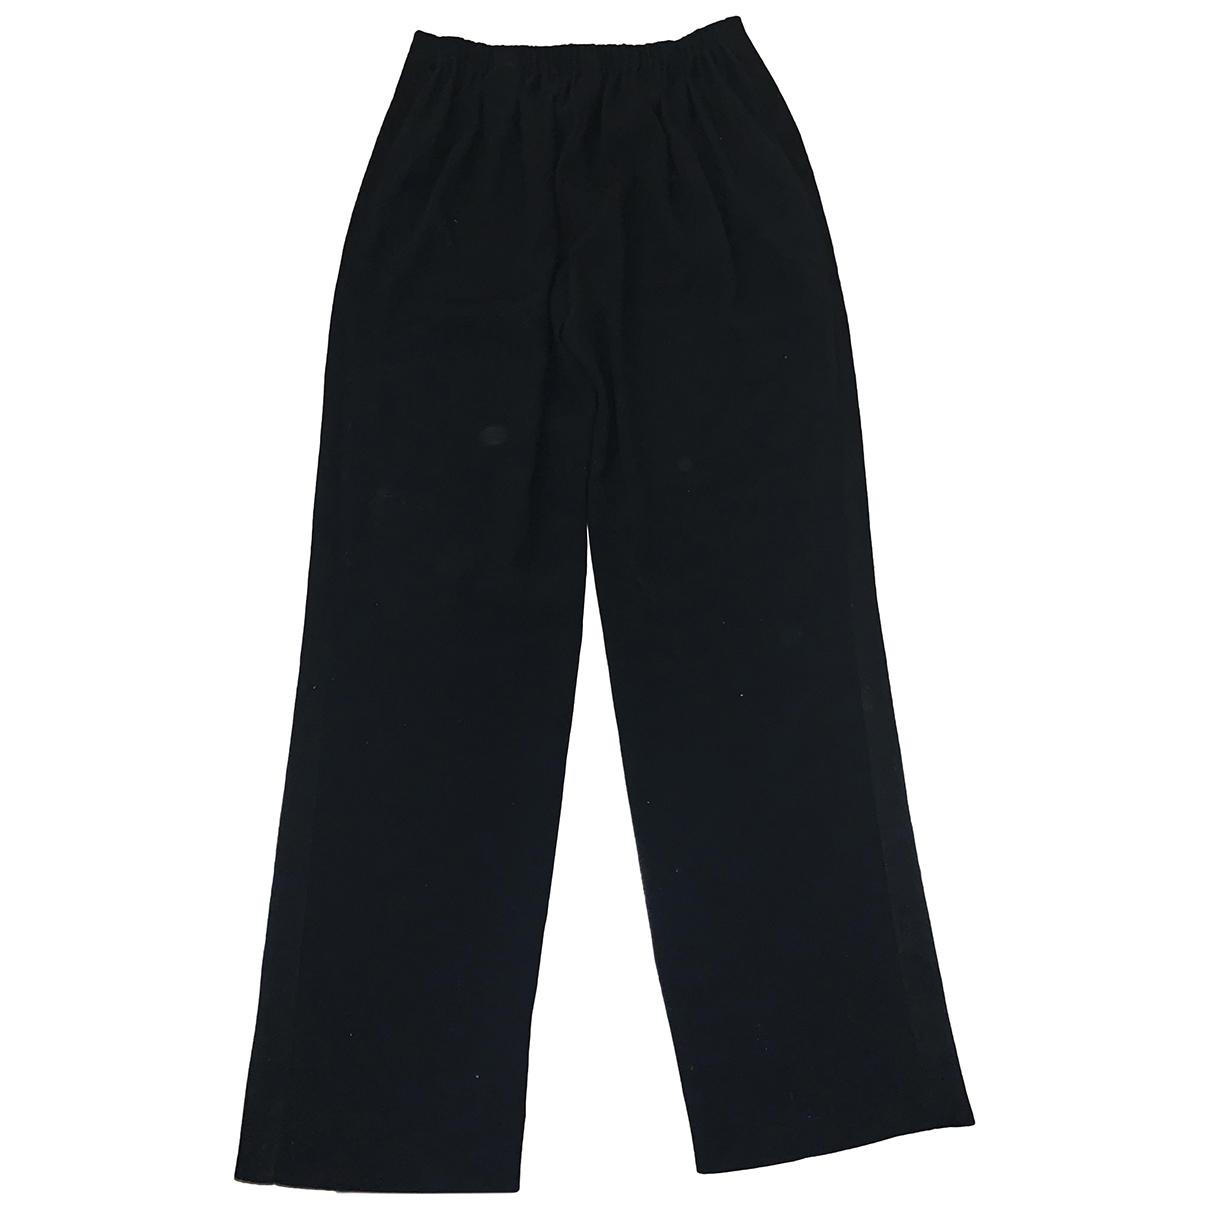 Kenzo \N Black Cotton Trousers for Women 38 FR